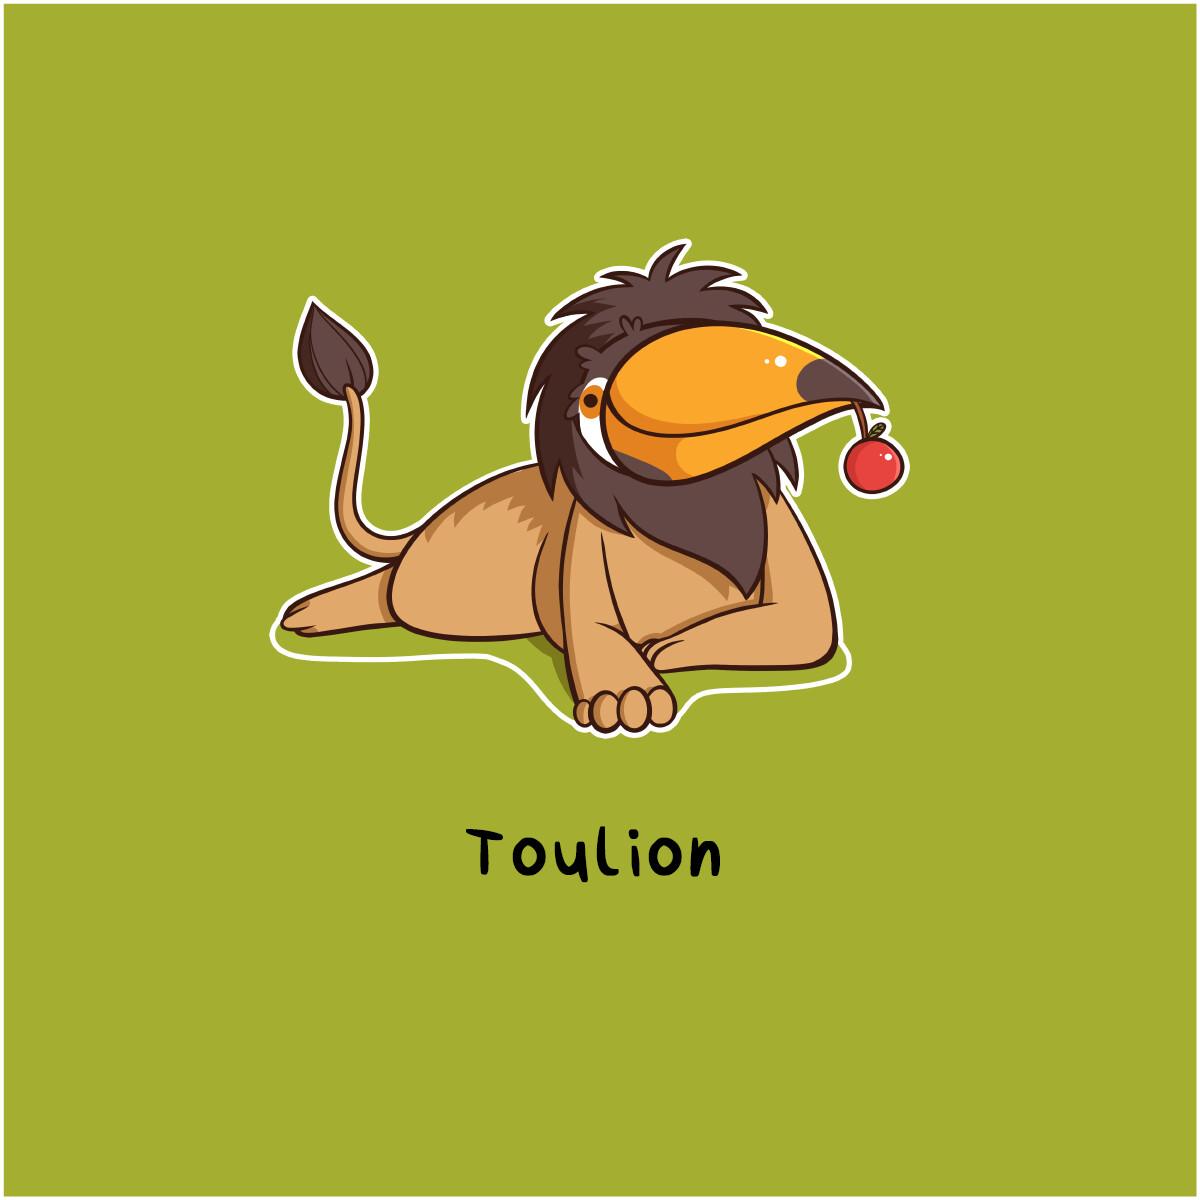 A toucan-lion hybrid.